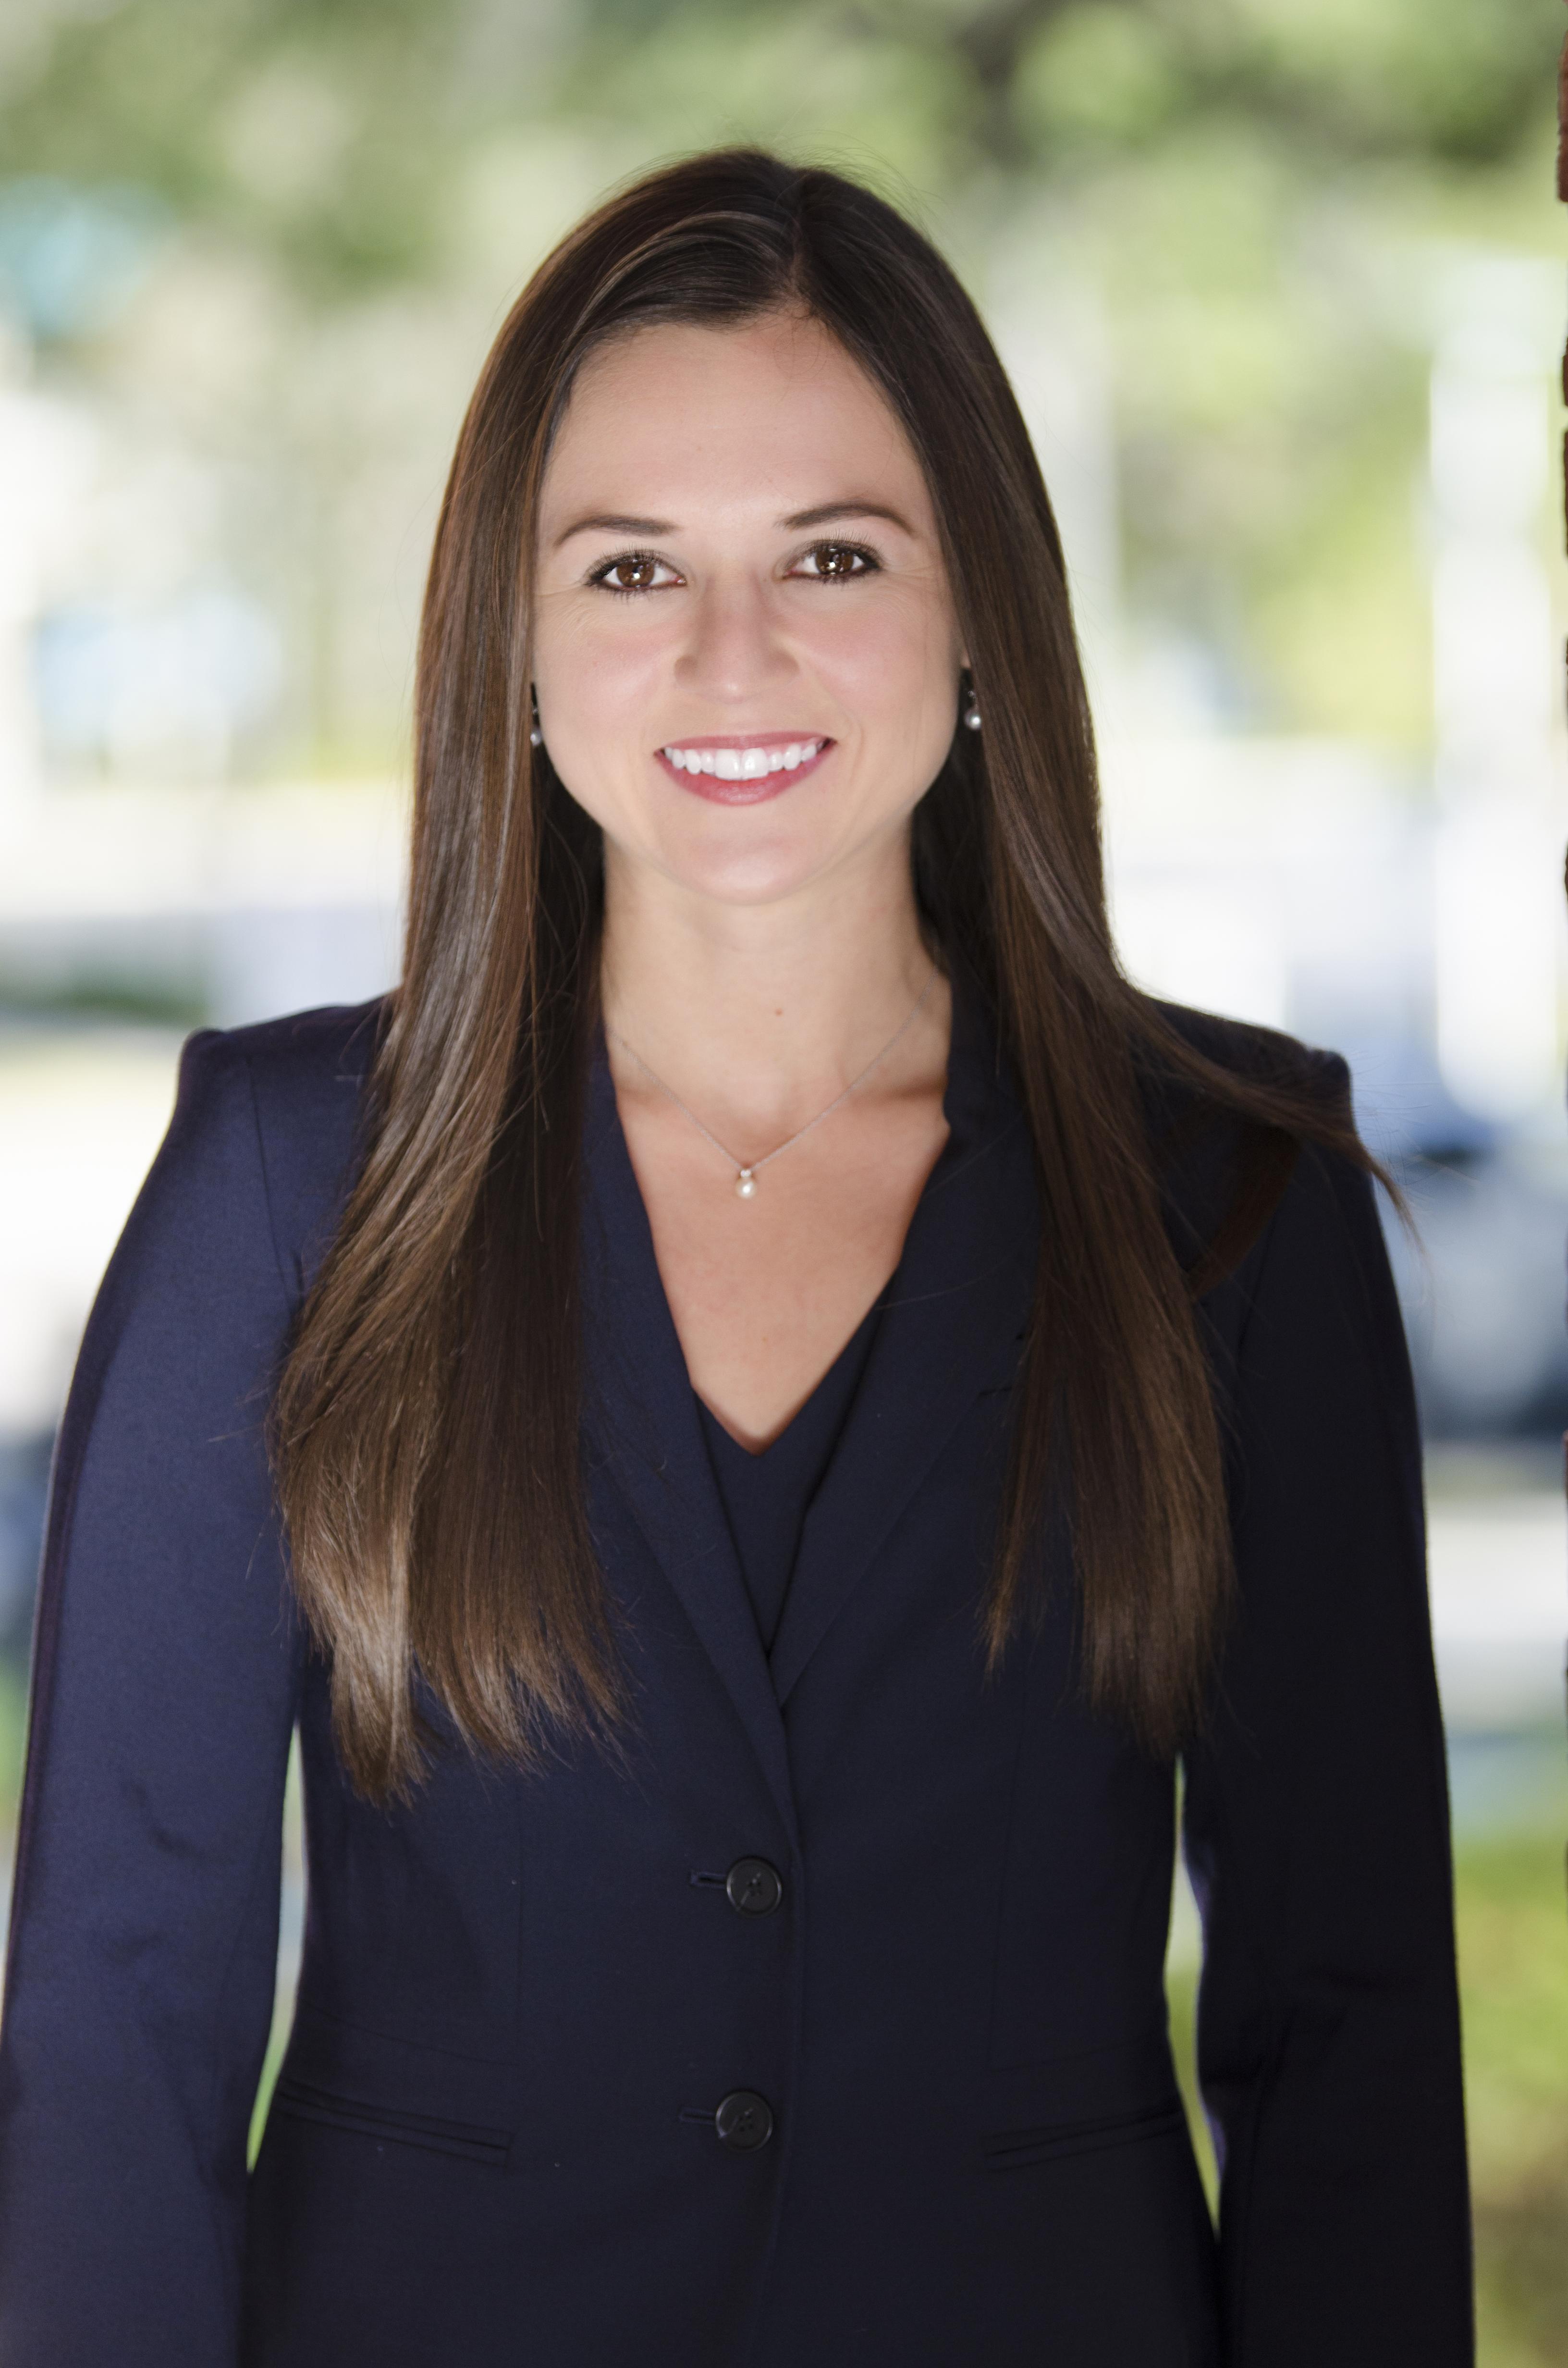 Madison Bullman